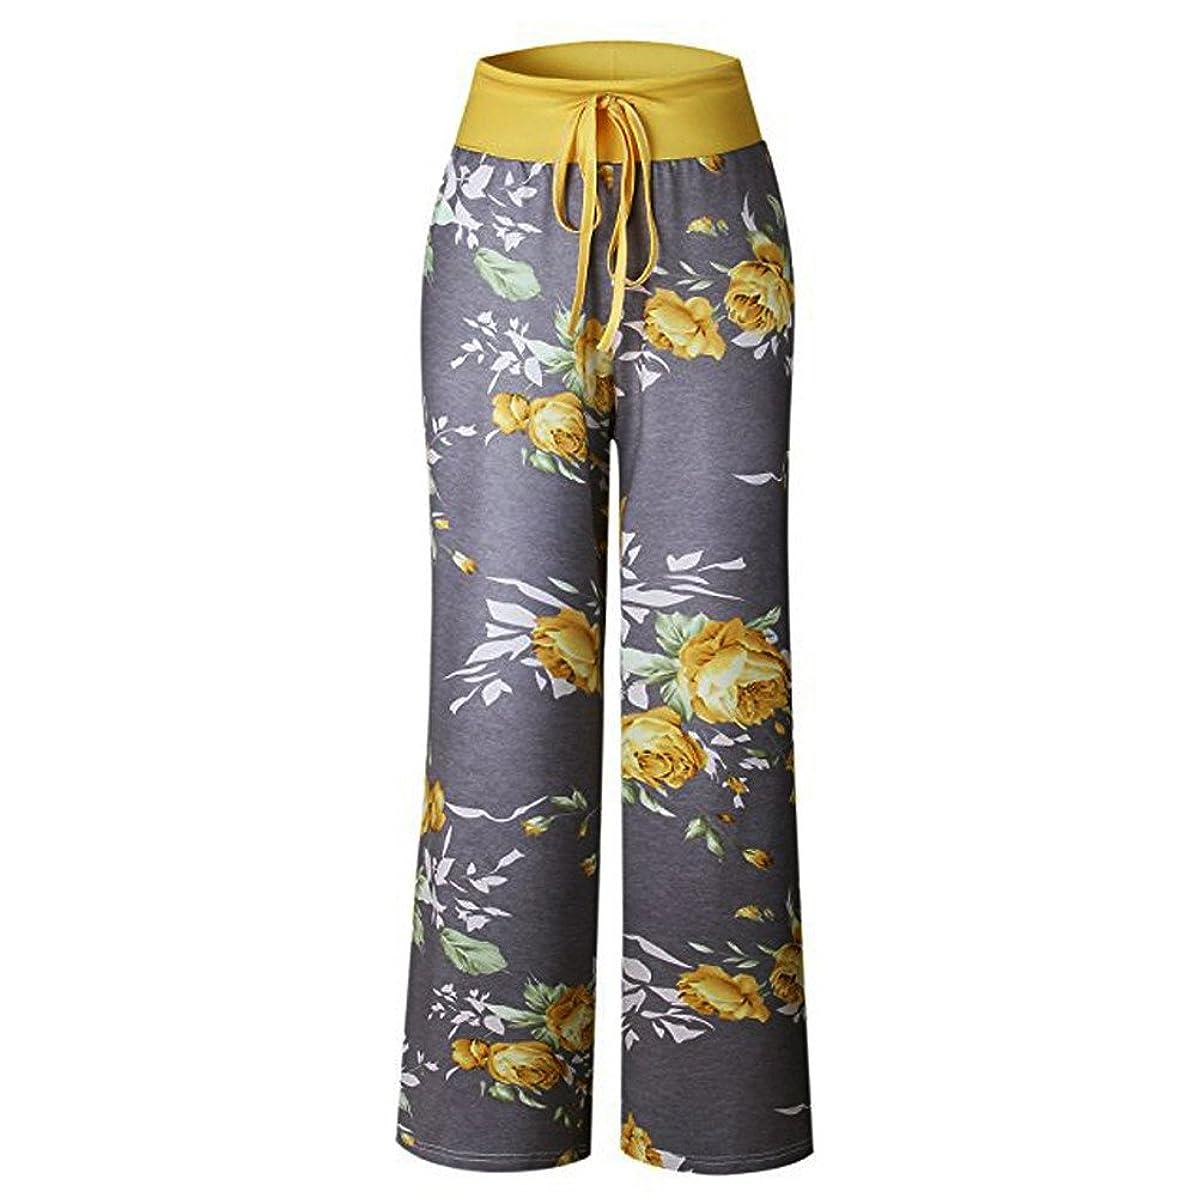 Lanhui Women Comfy Stretch Floral Print Drawstring Pants Palazzo High Waist Wide Leg Lounge Pants (3X-Large, Yellow)